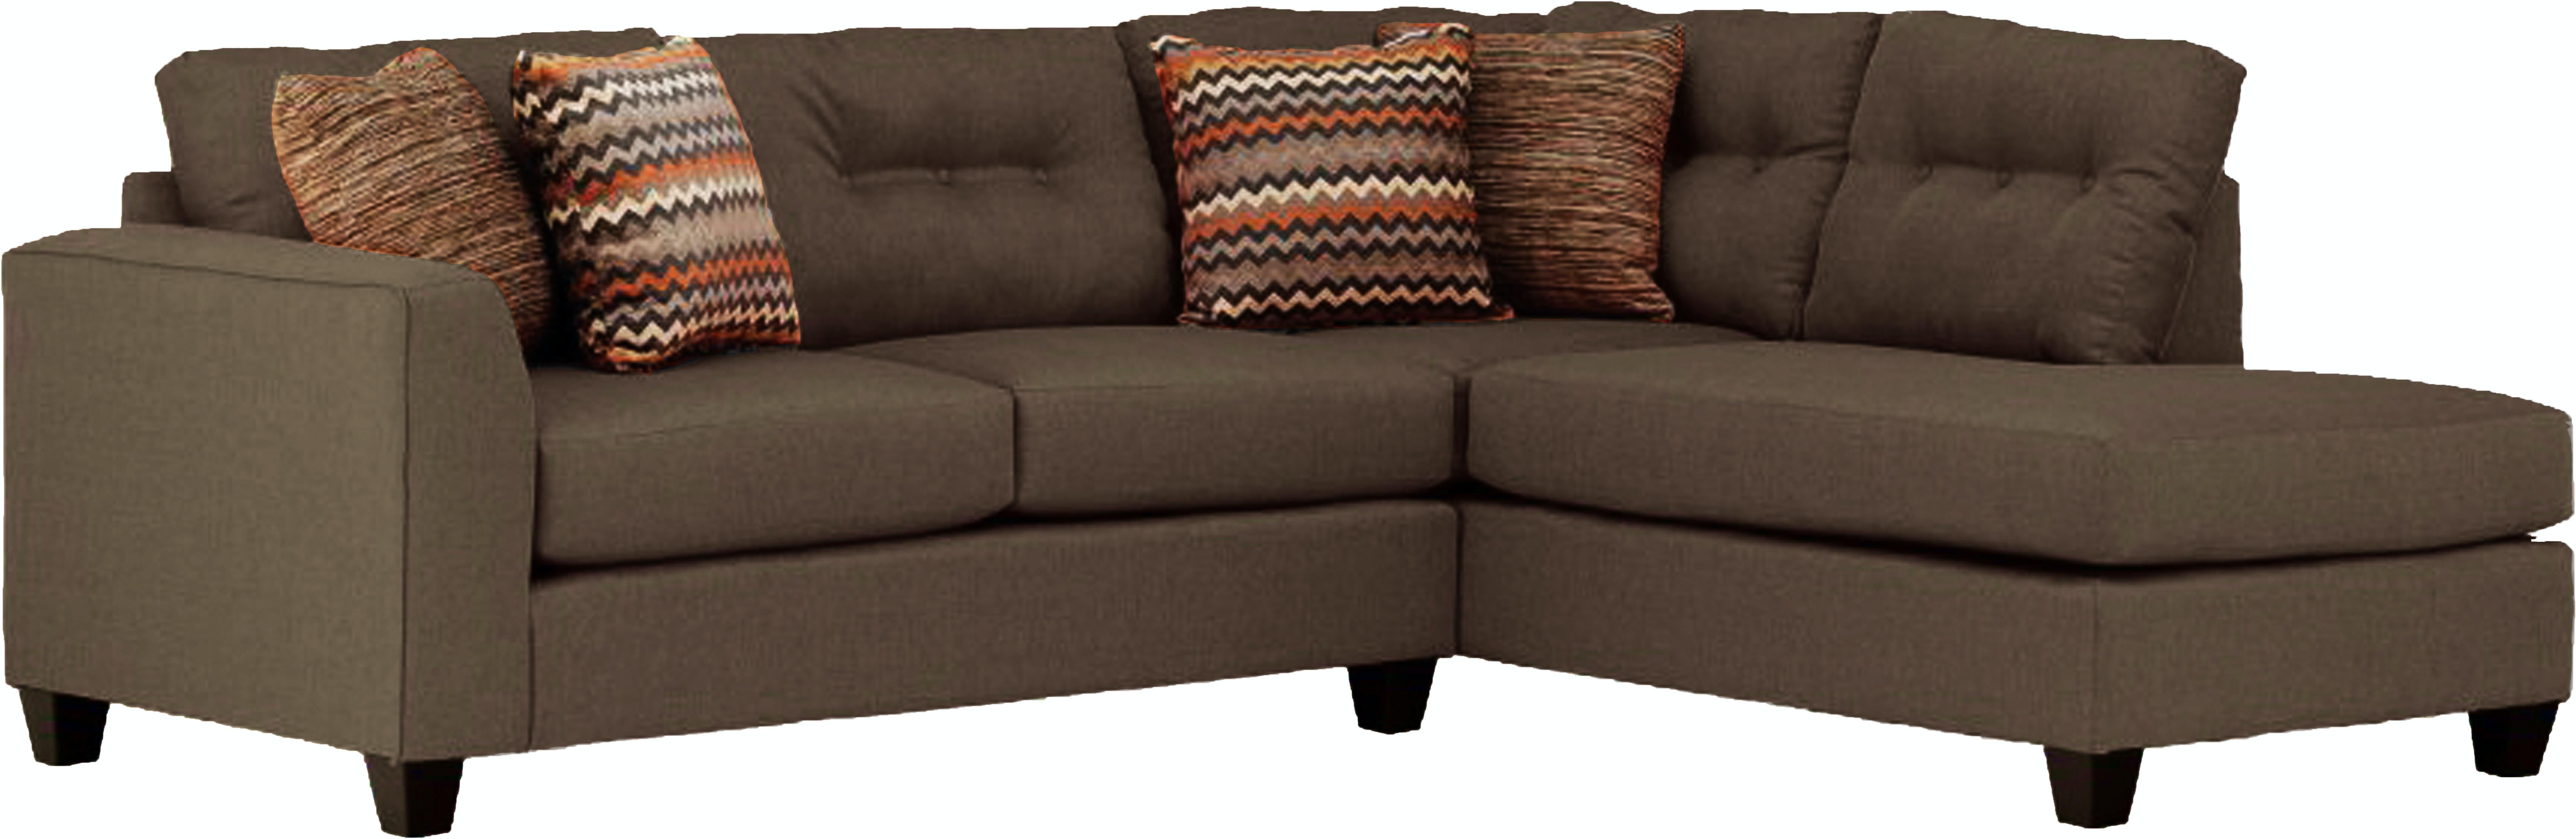 Fusion Living Room Fandango Mocha Sectional Furniture